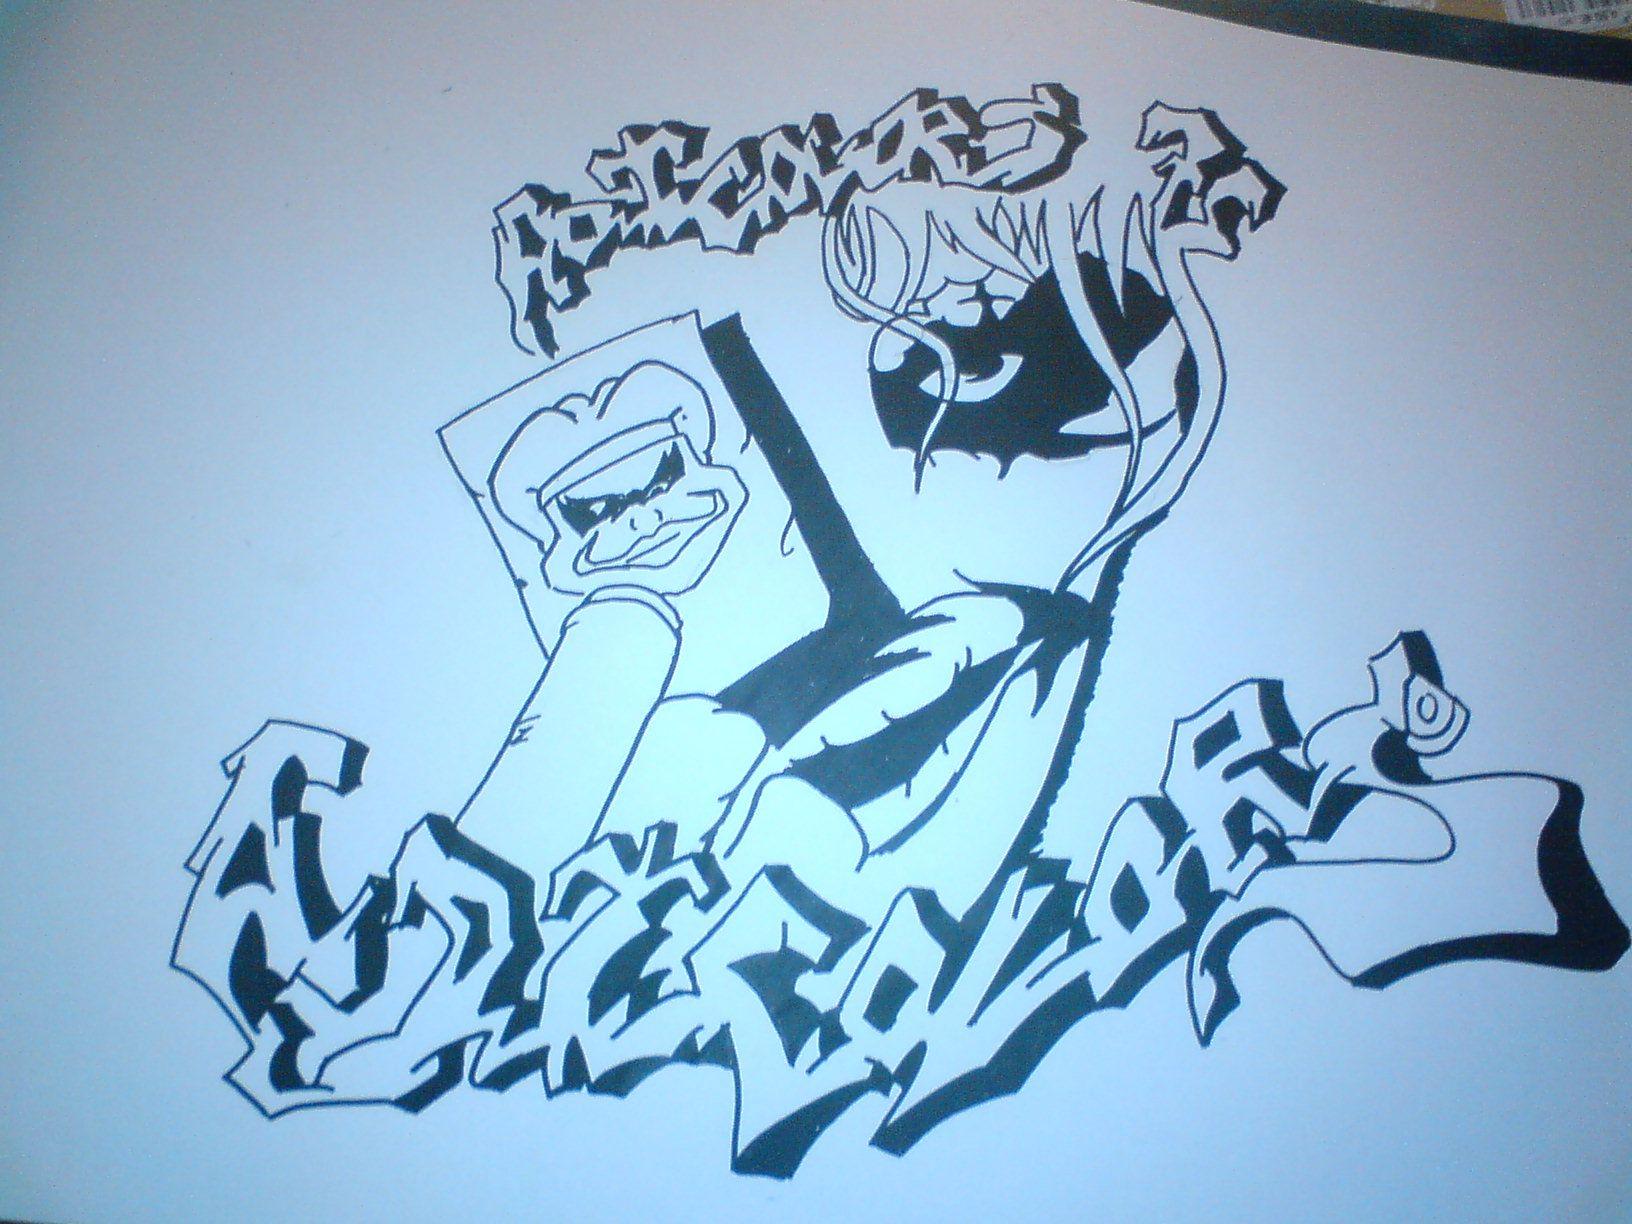 adicolors 75 - Dessin Graffiti